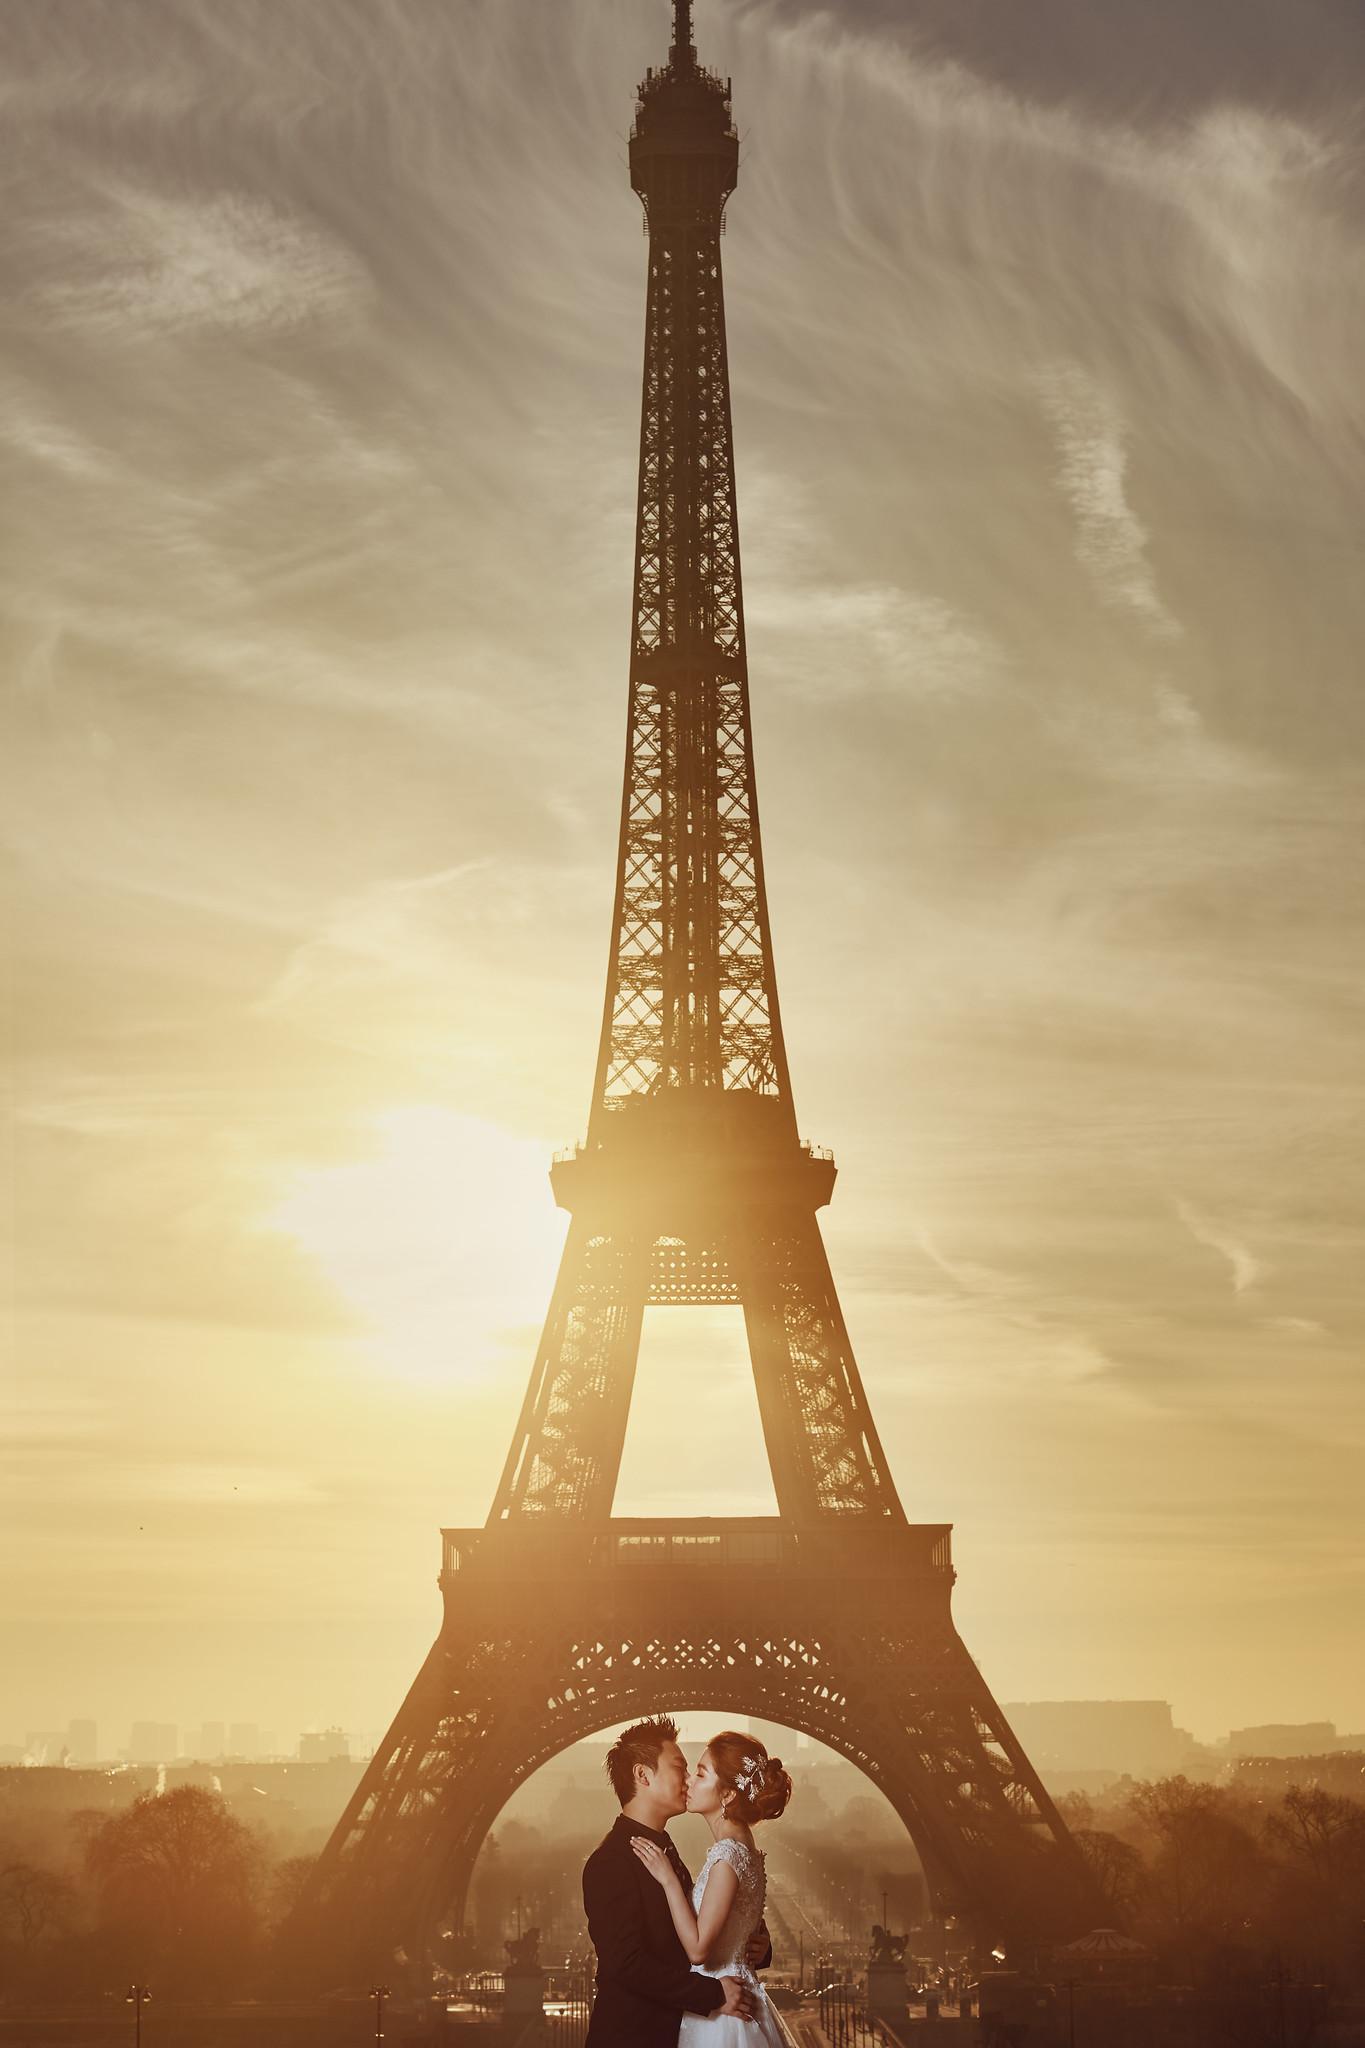 World Tour, Oversea, 海外婚紗, 旅行婚紗, Donfer, Fine Art, 海外計劃, 海外婚禮